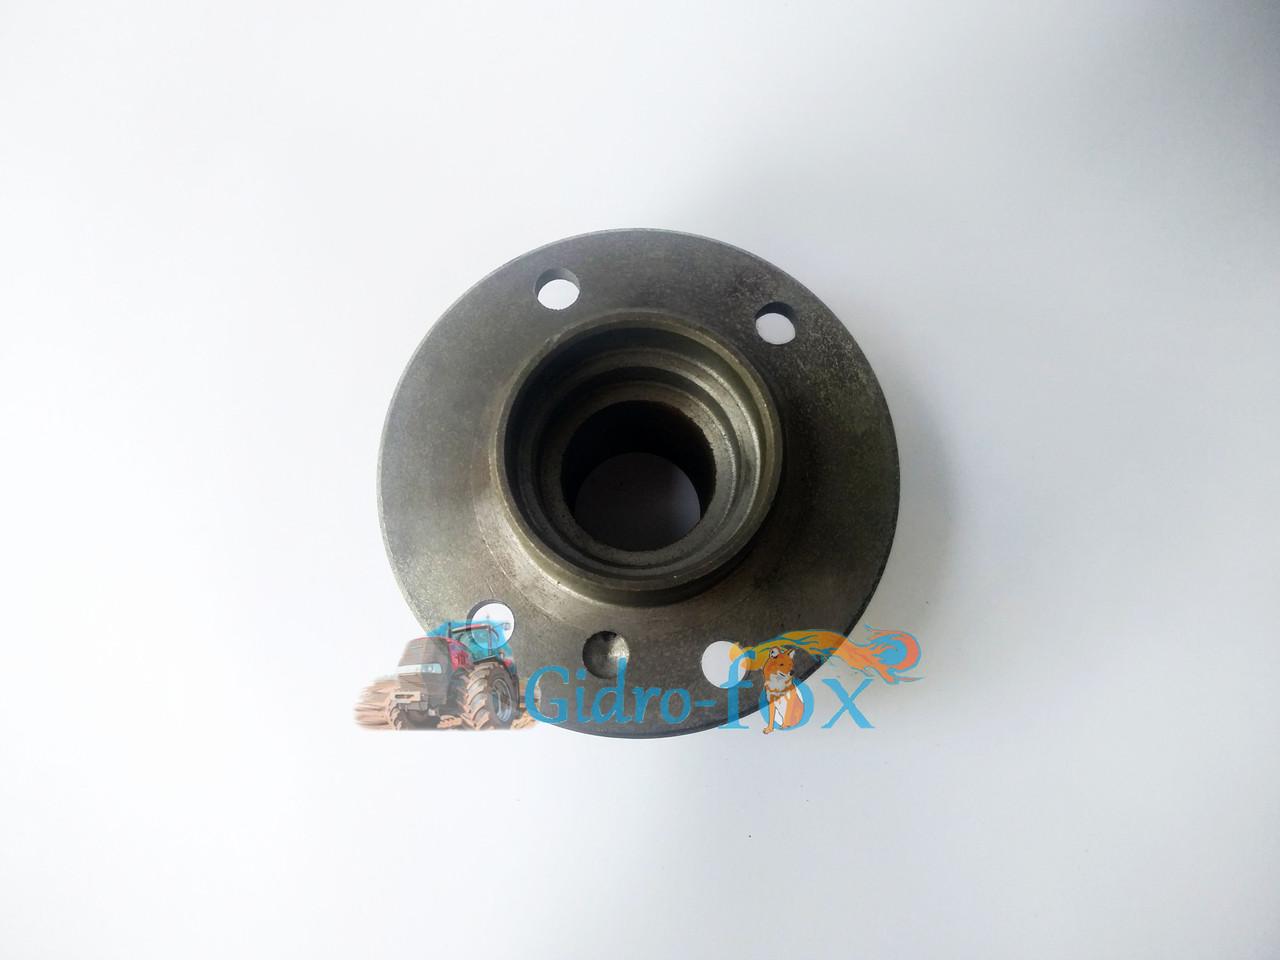 Фланец установочный привода ТНВД УТН МТЗ, ЮМЗ (Д-240, Д-65) под сальник Кт.Н. 4УТНМ-1111162-10